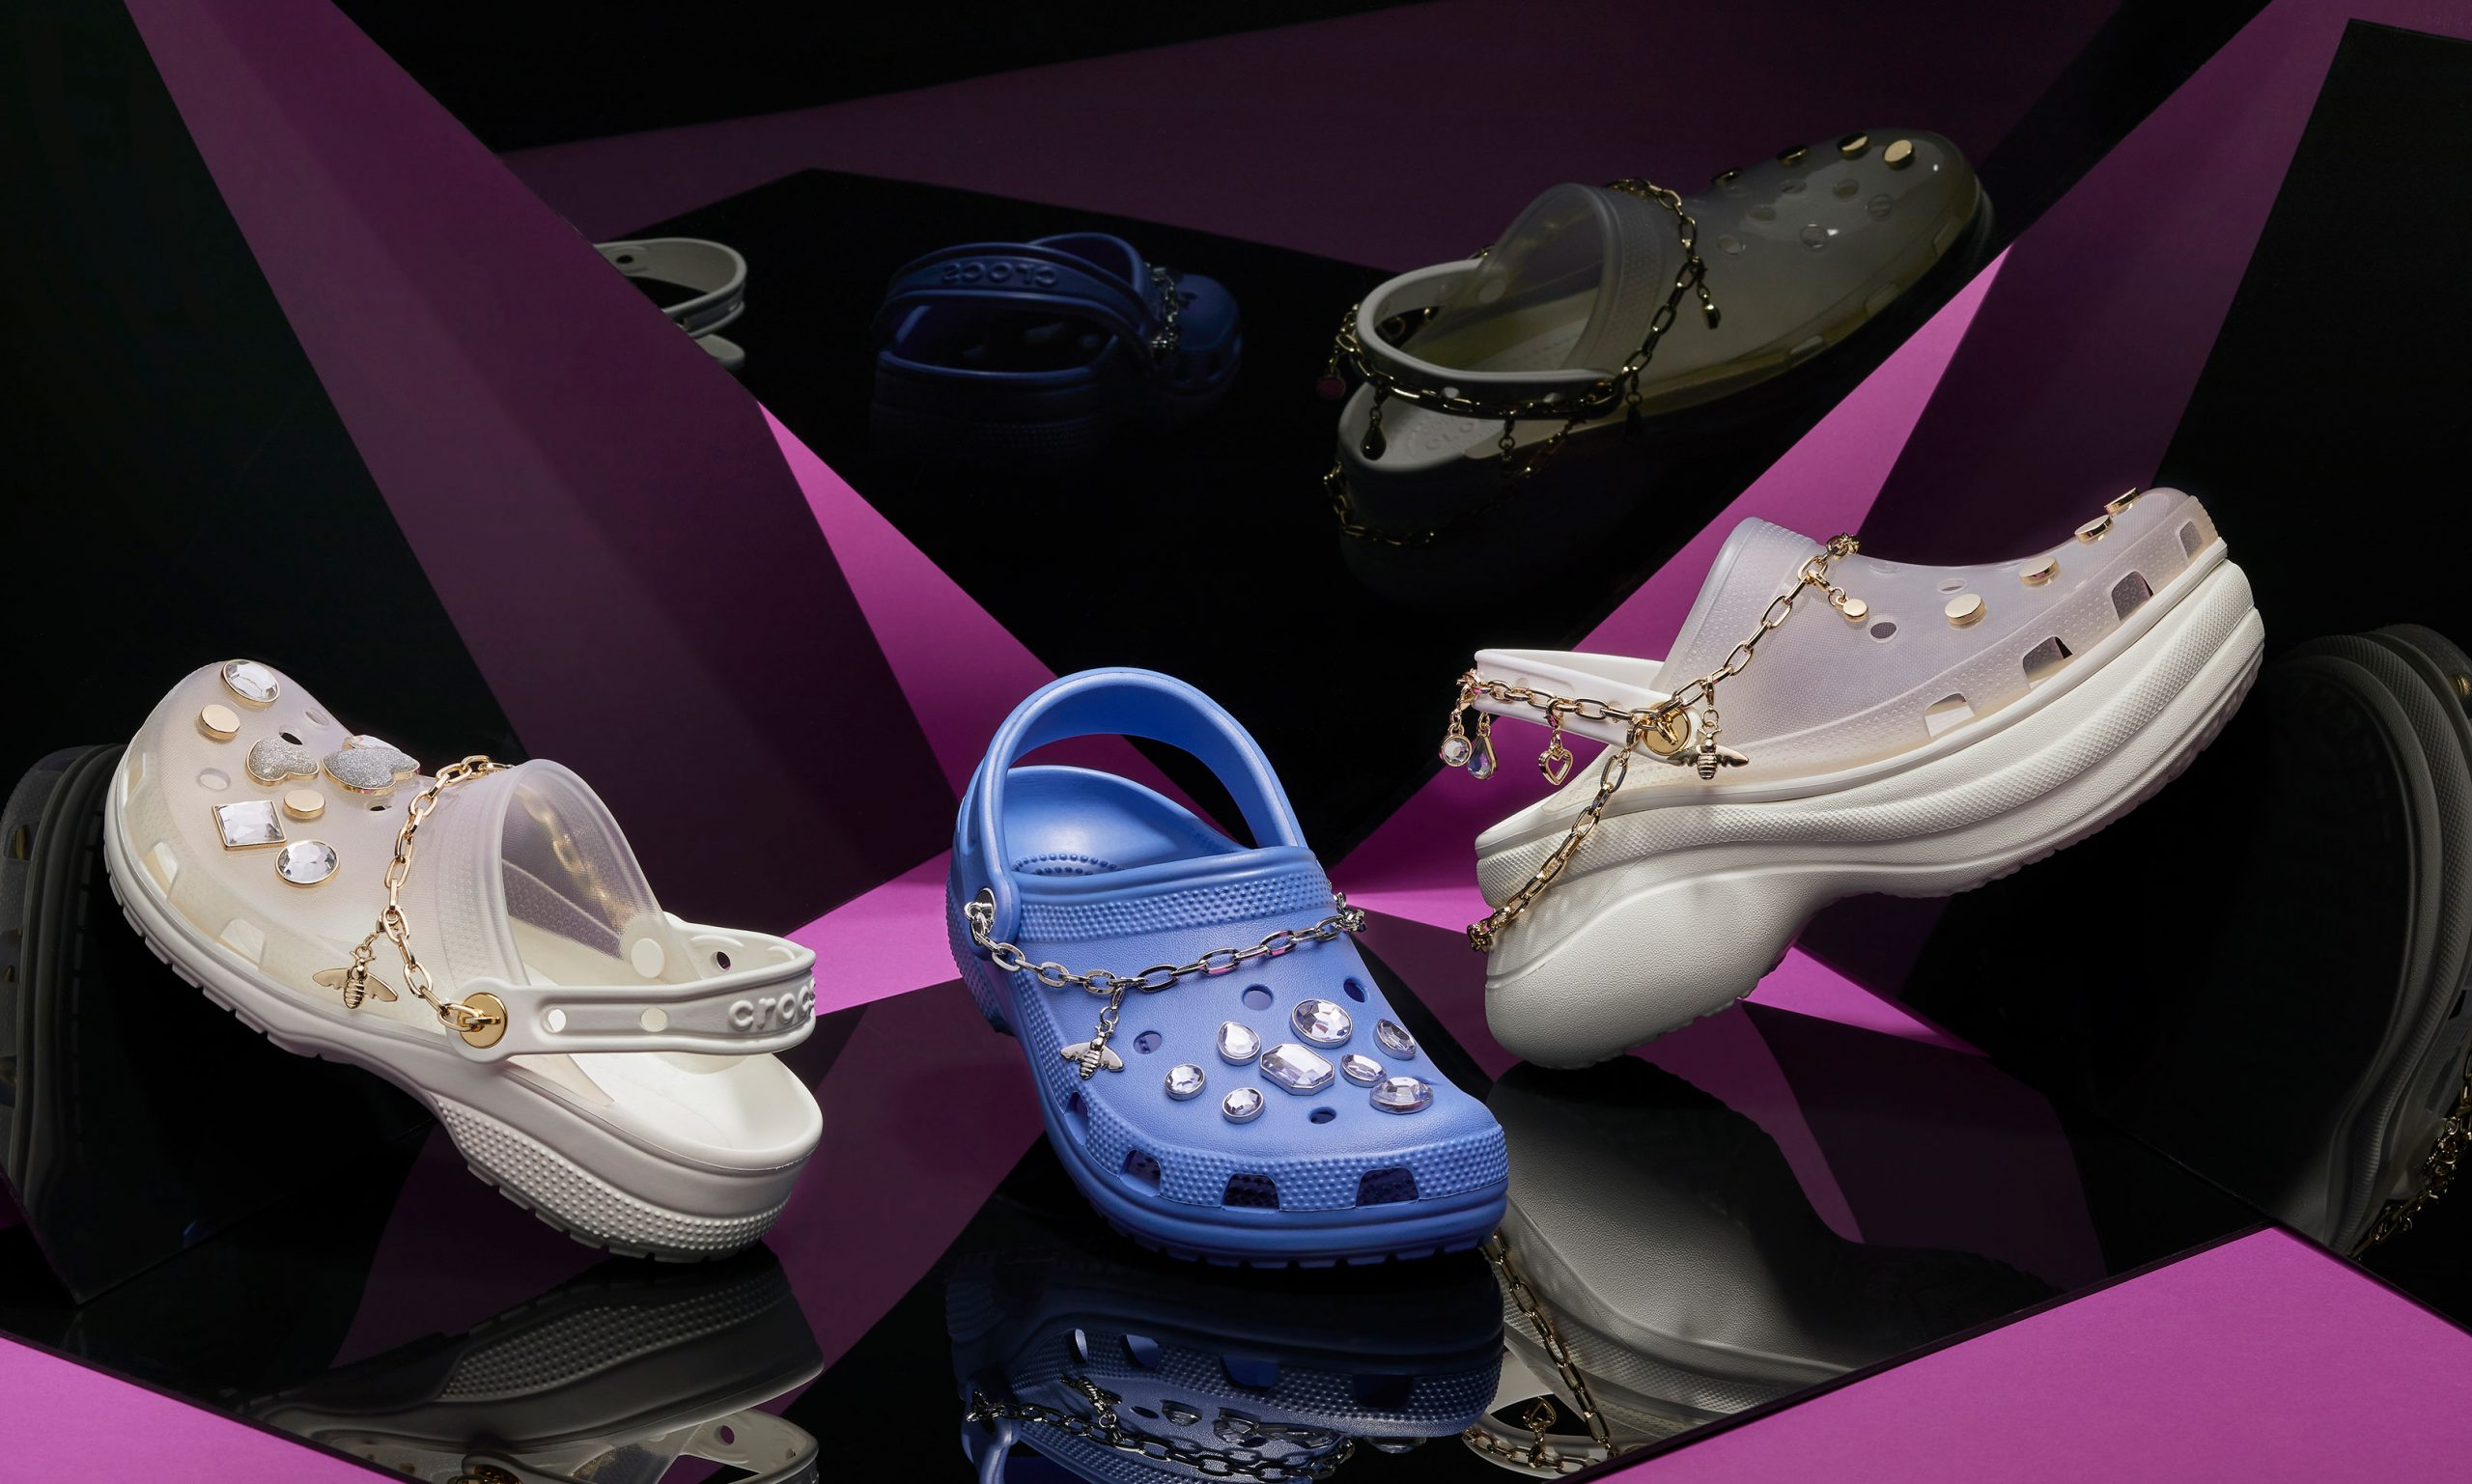 Crocs 推出杨幂特别定制款洞洞鞋